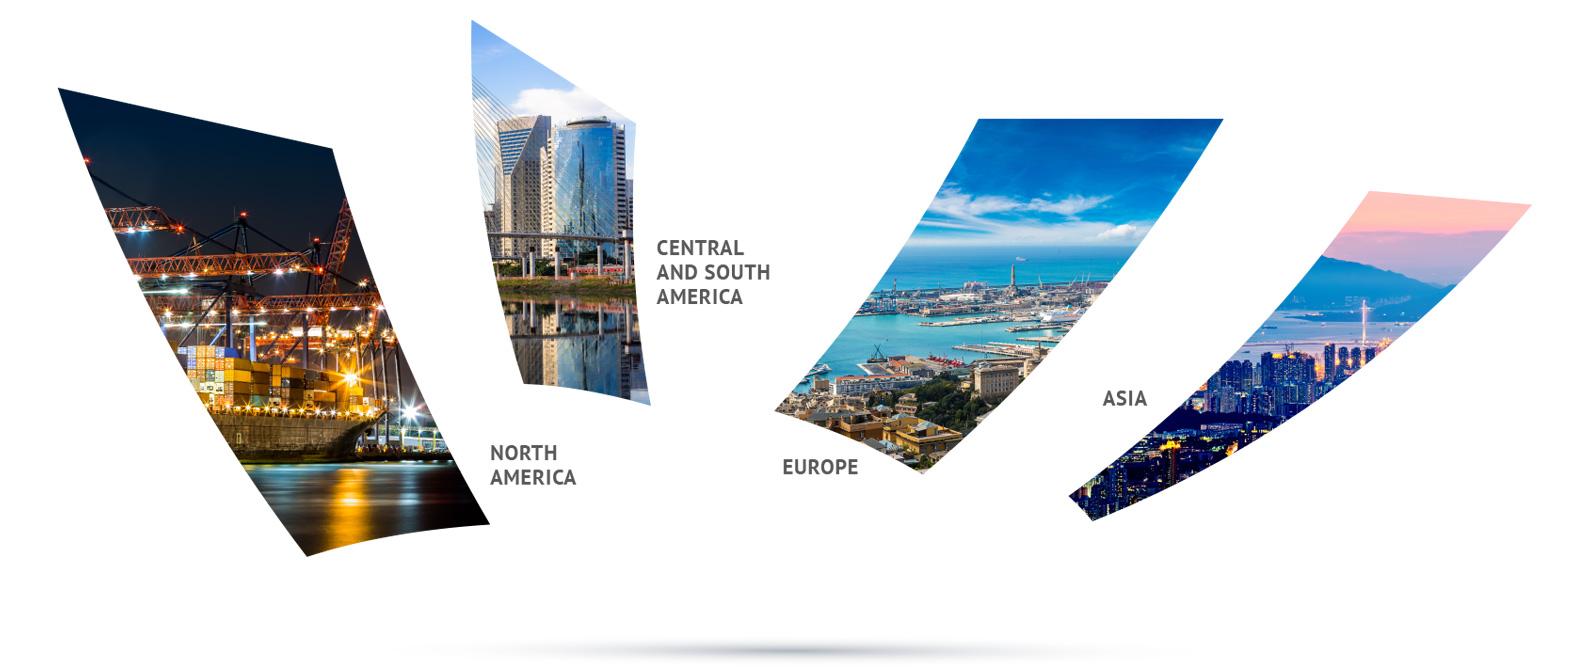 Interglobo global network